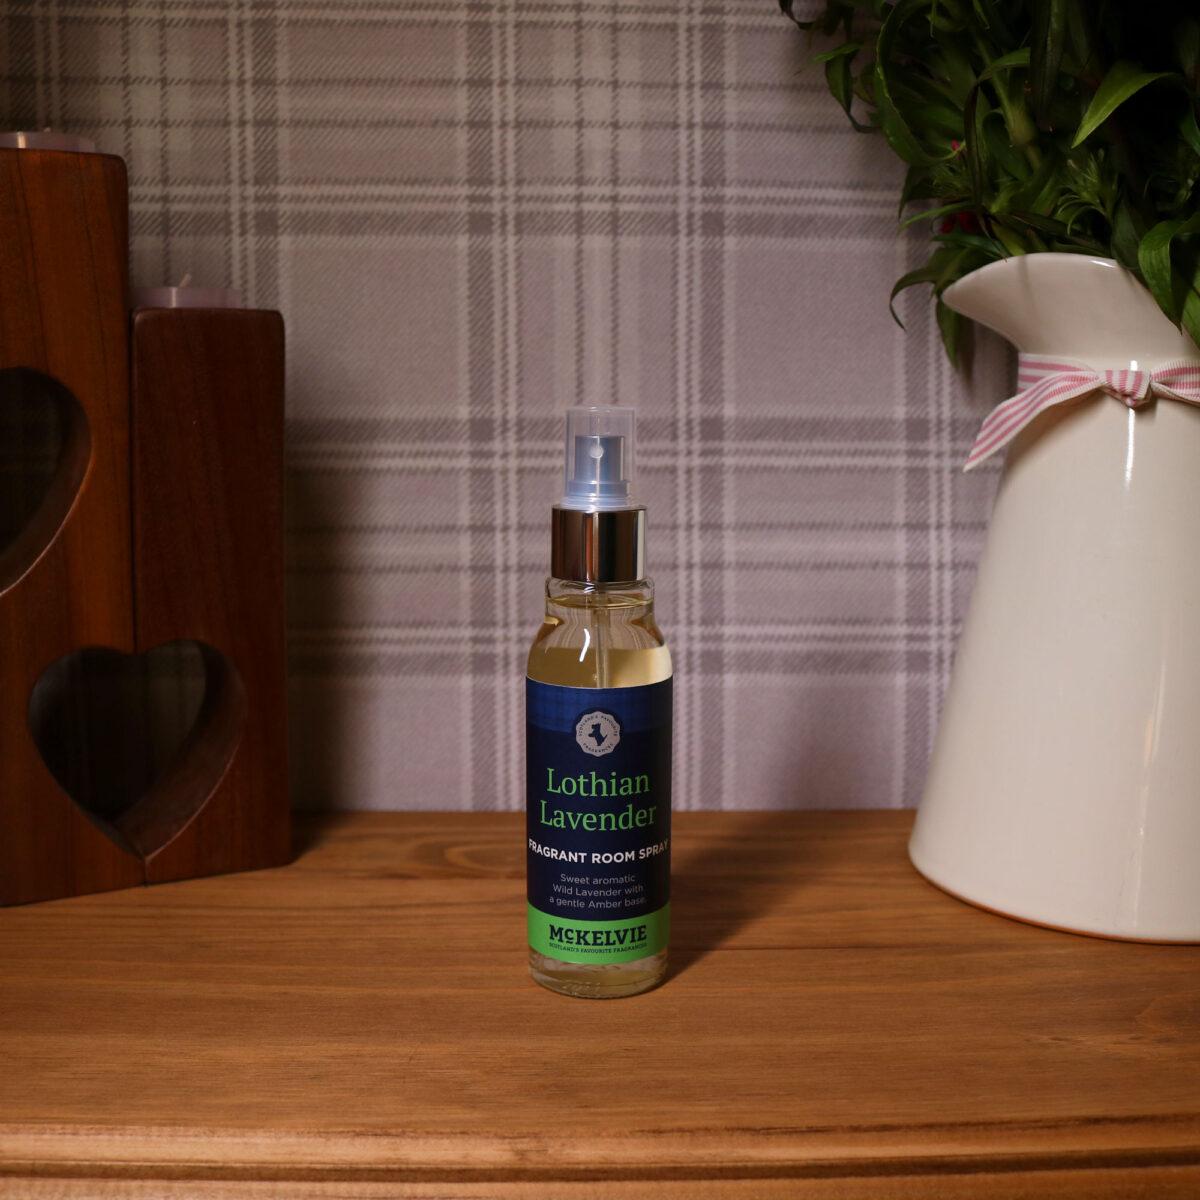 Lothian Lavender Fragrant Room Spray